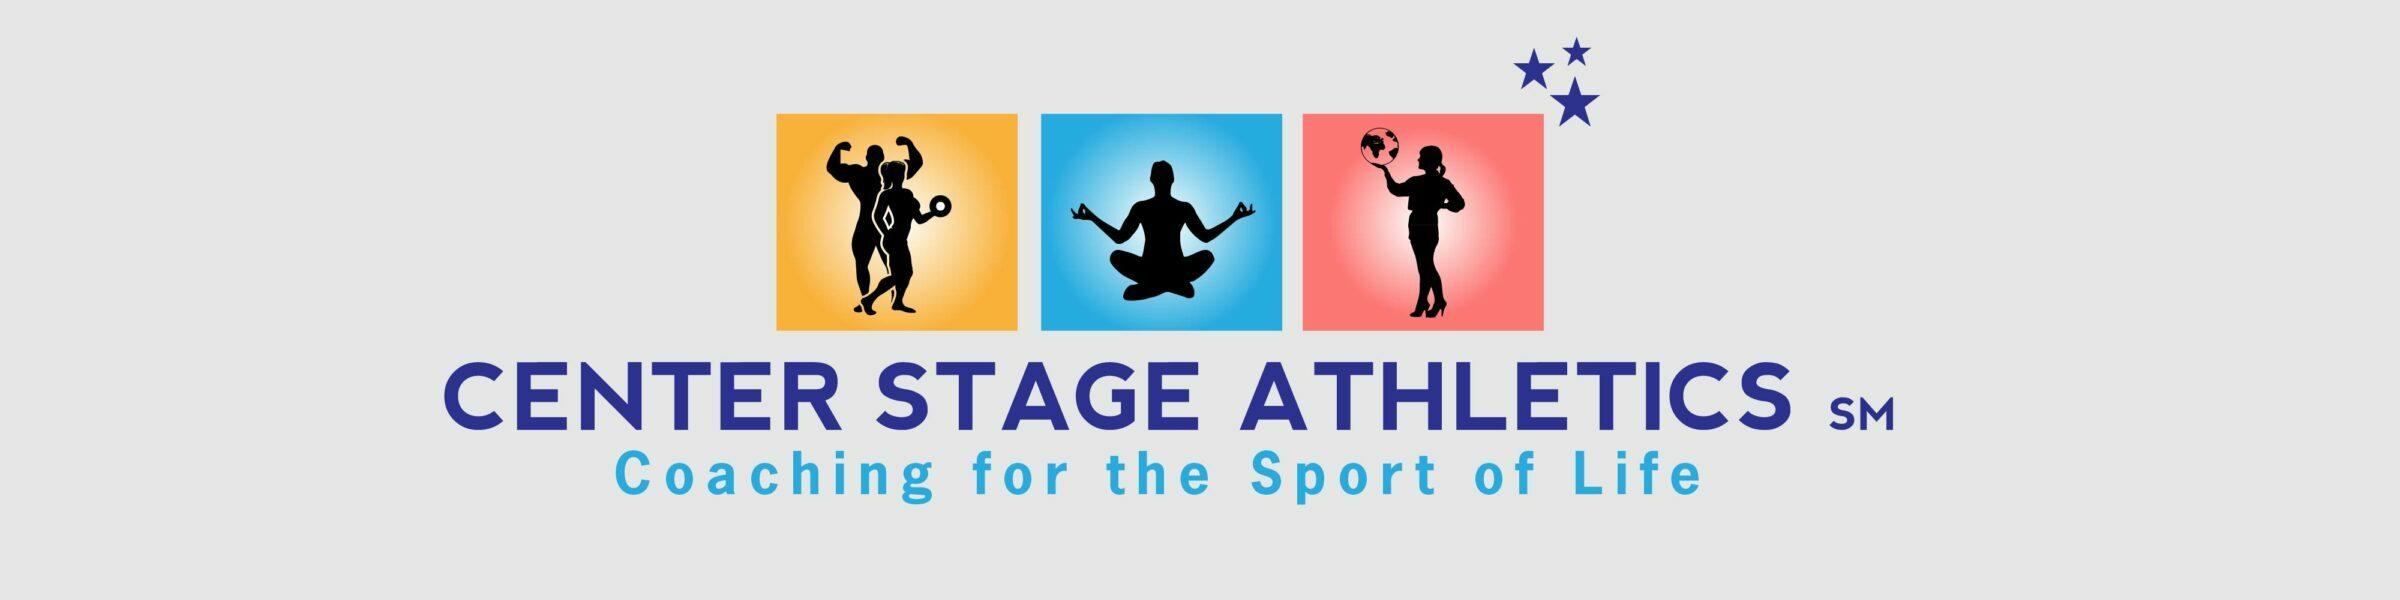 Center Stage Athletics & Team CSFP